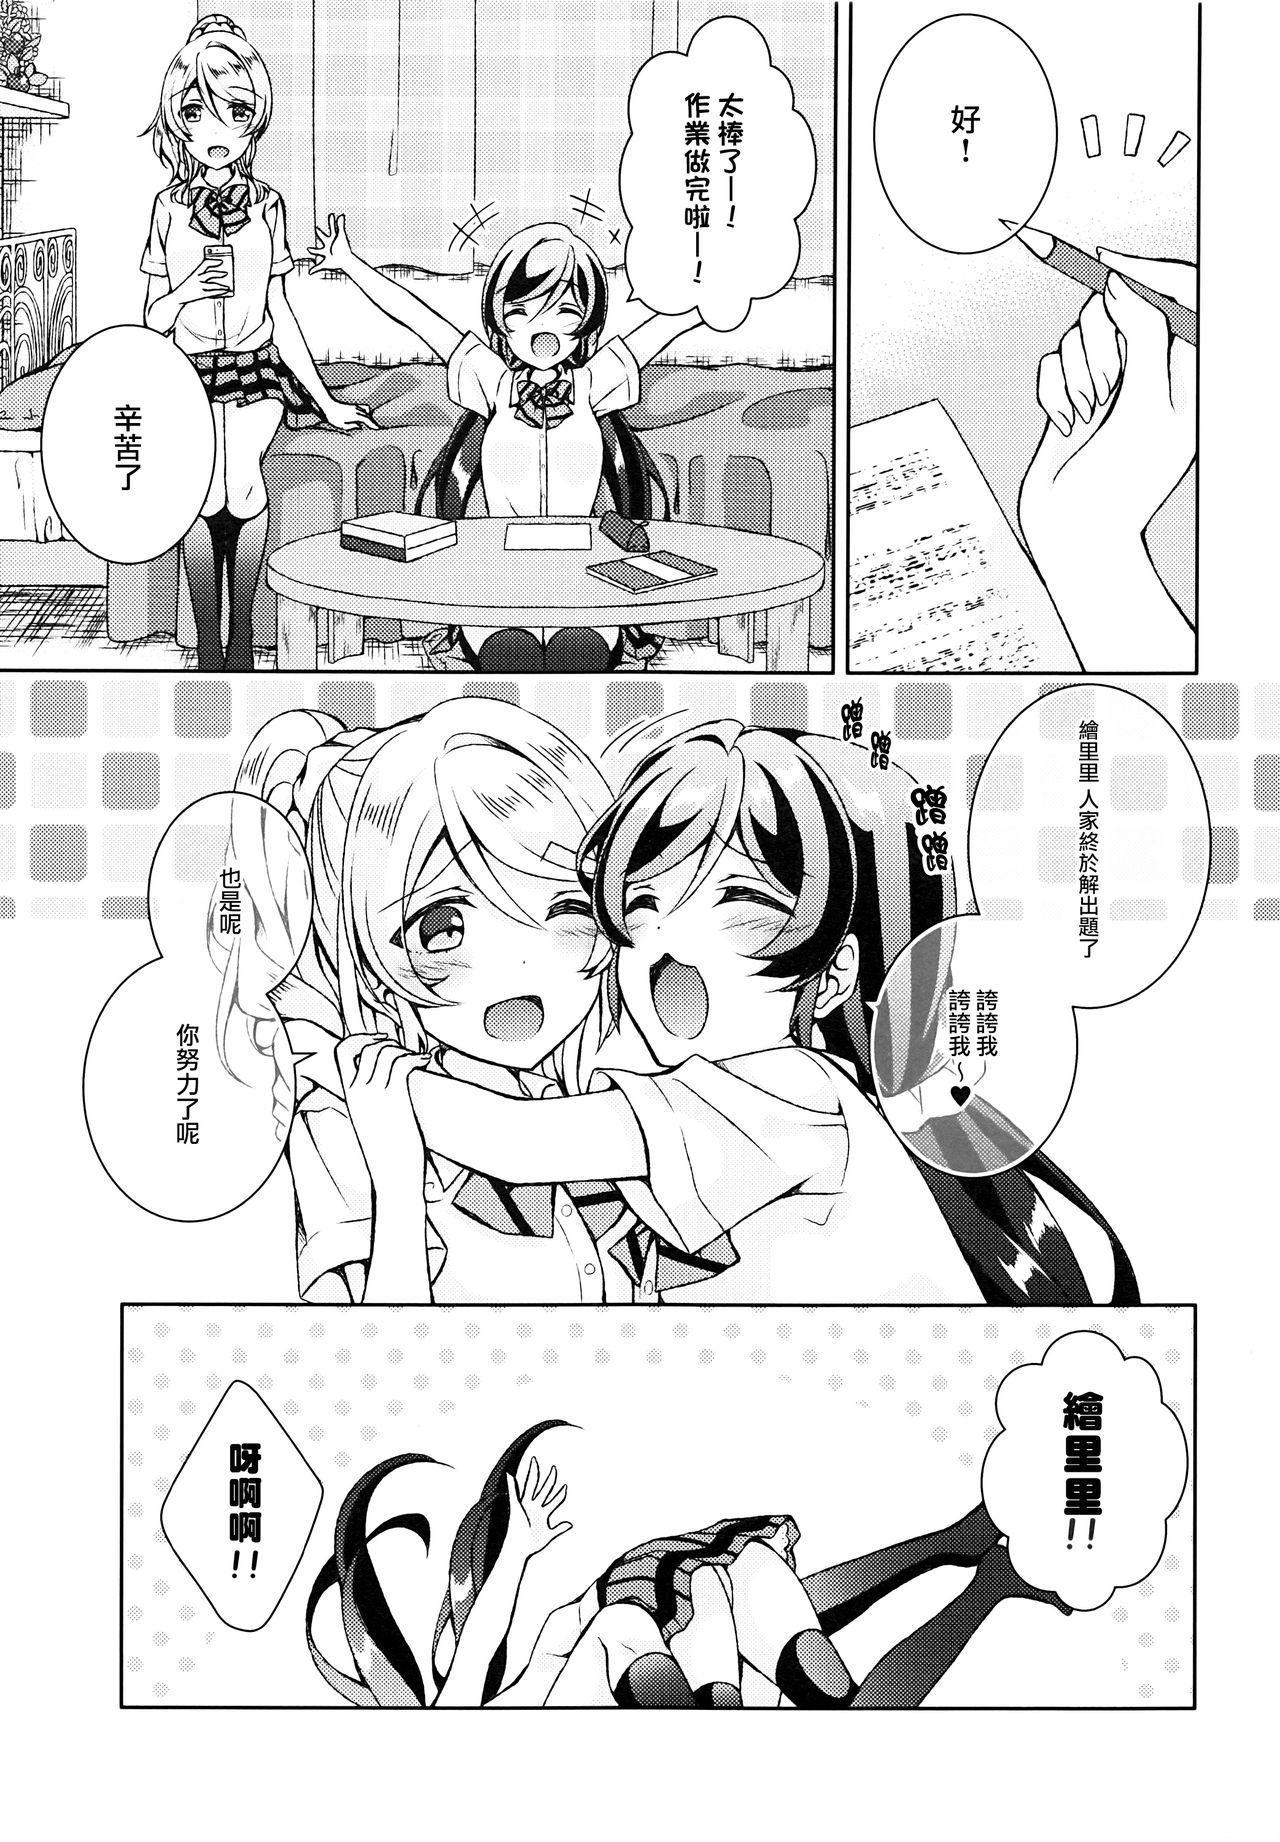 Futanari Sex 4